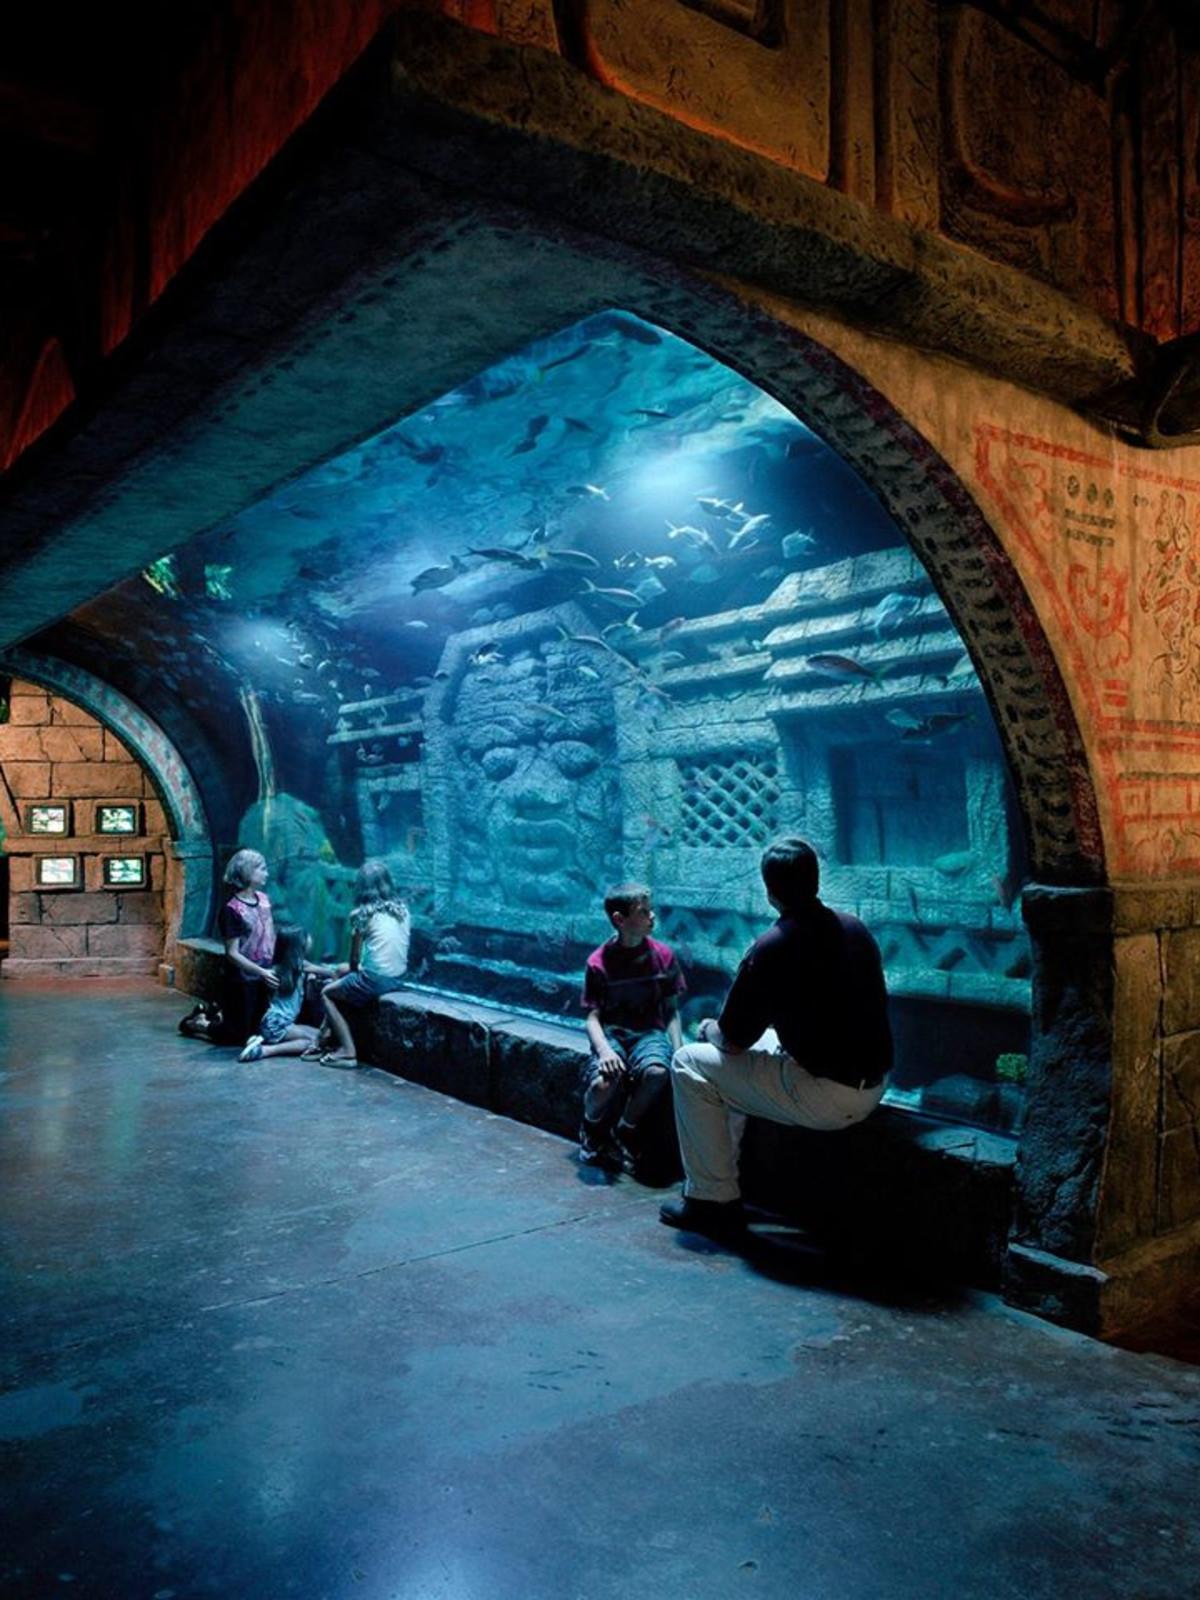 Shark Weekend at the Downtown Aquarium